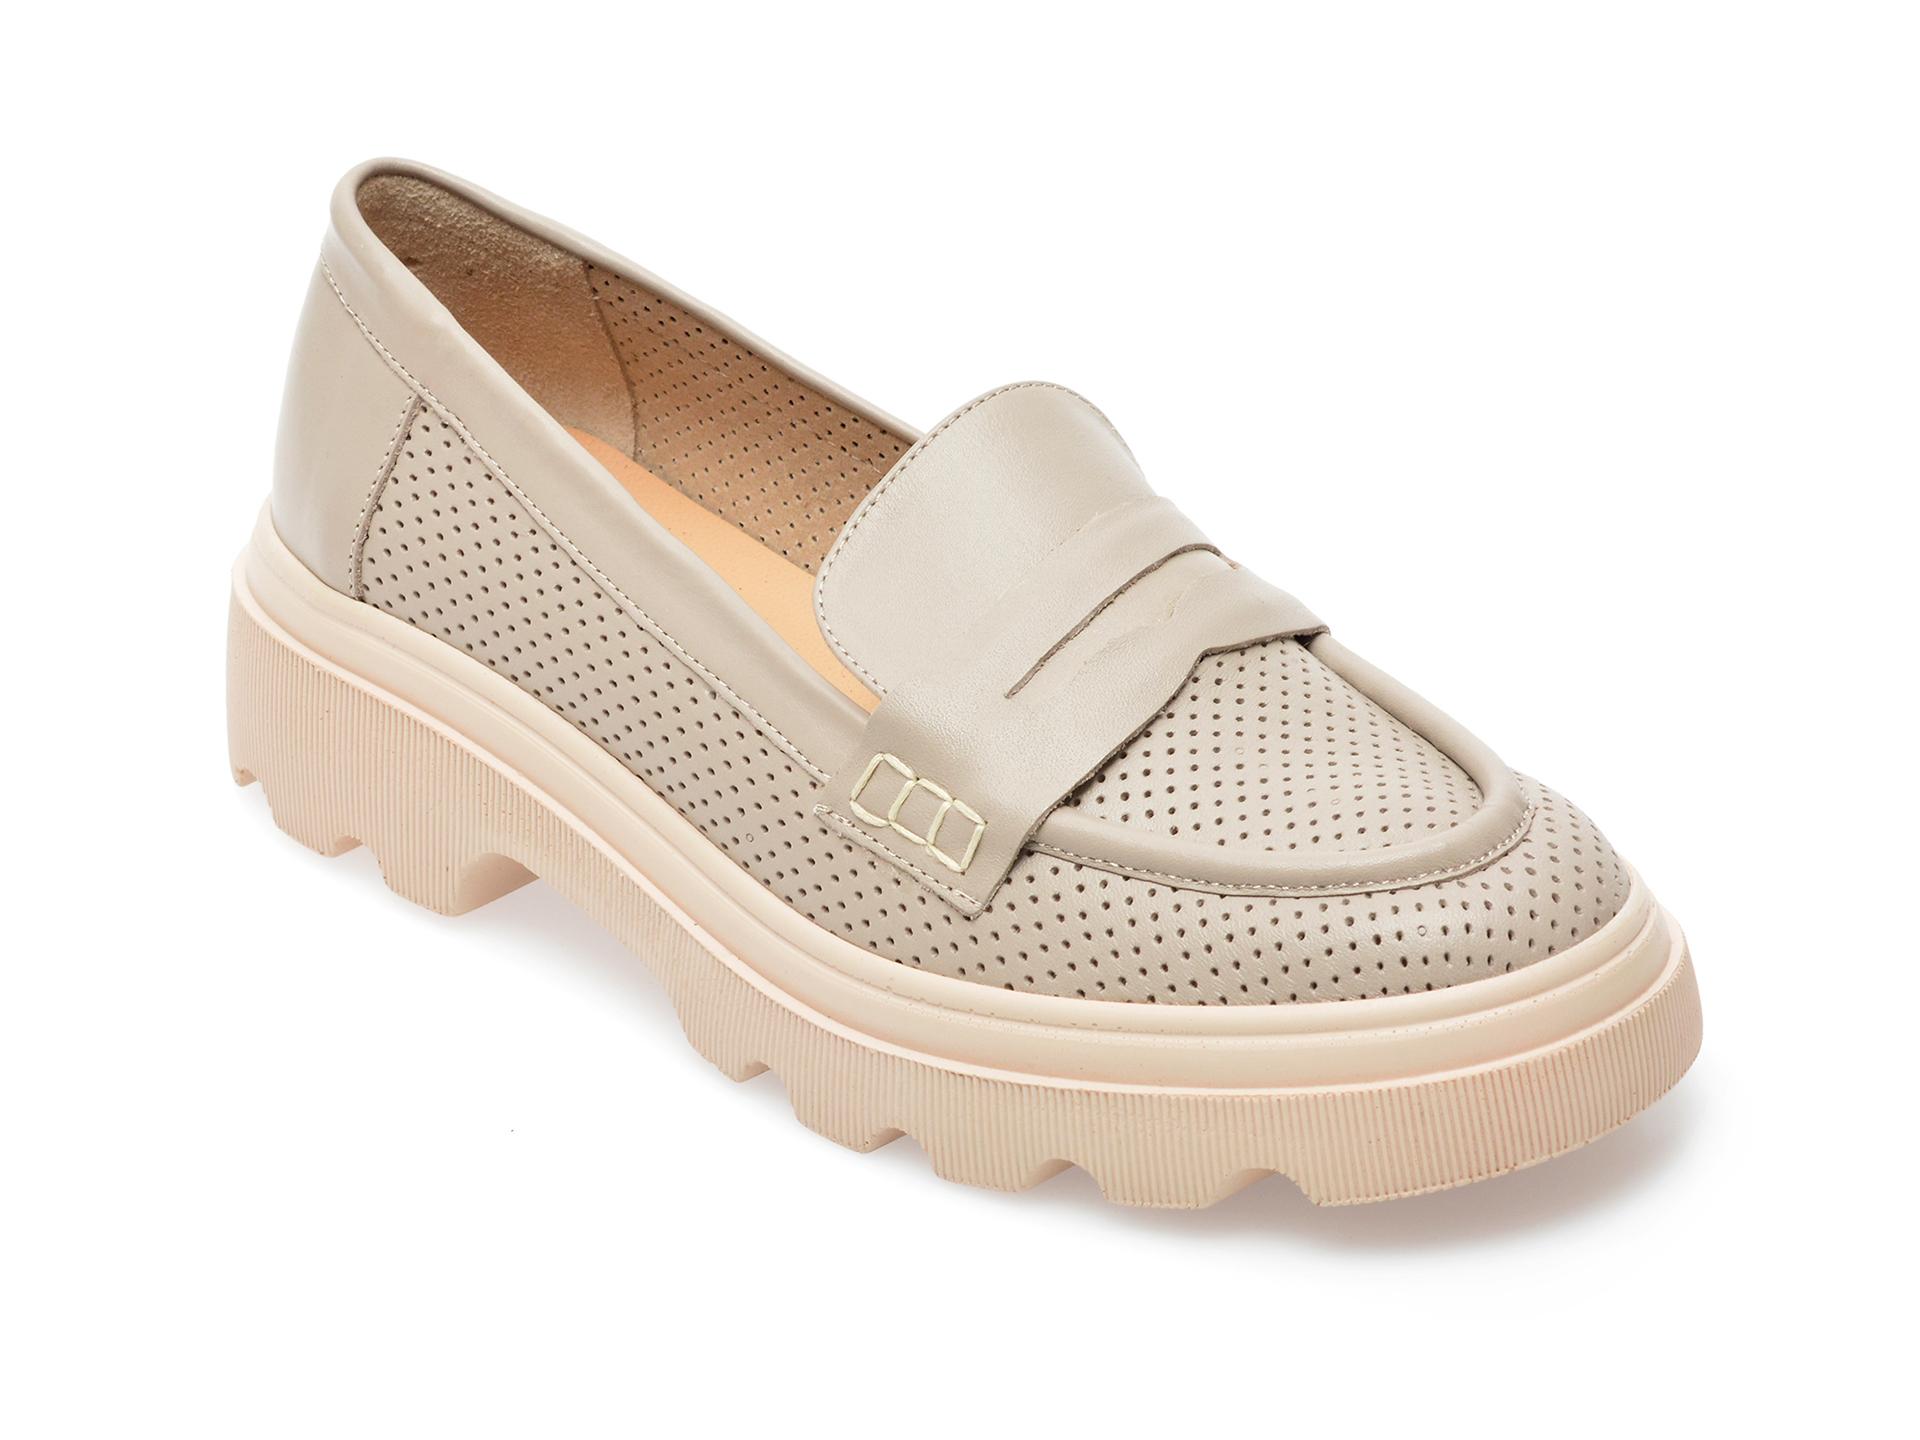 Pantofi GRYXX gri, 1951011, din piele naturala imagine otter.ro 2021